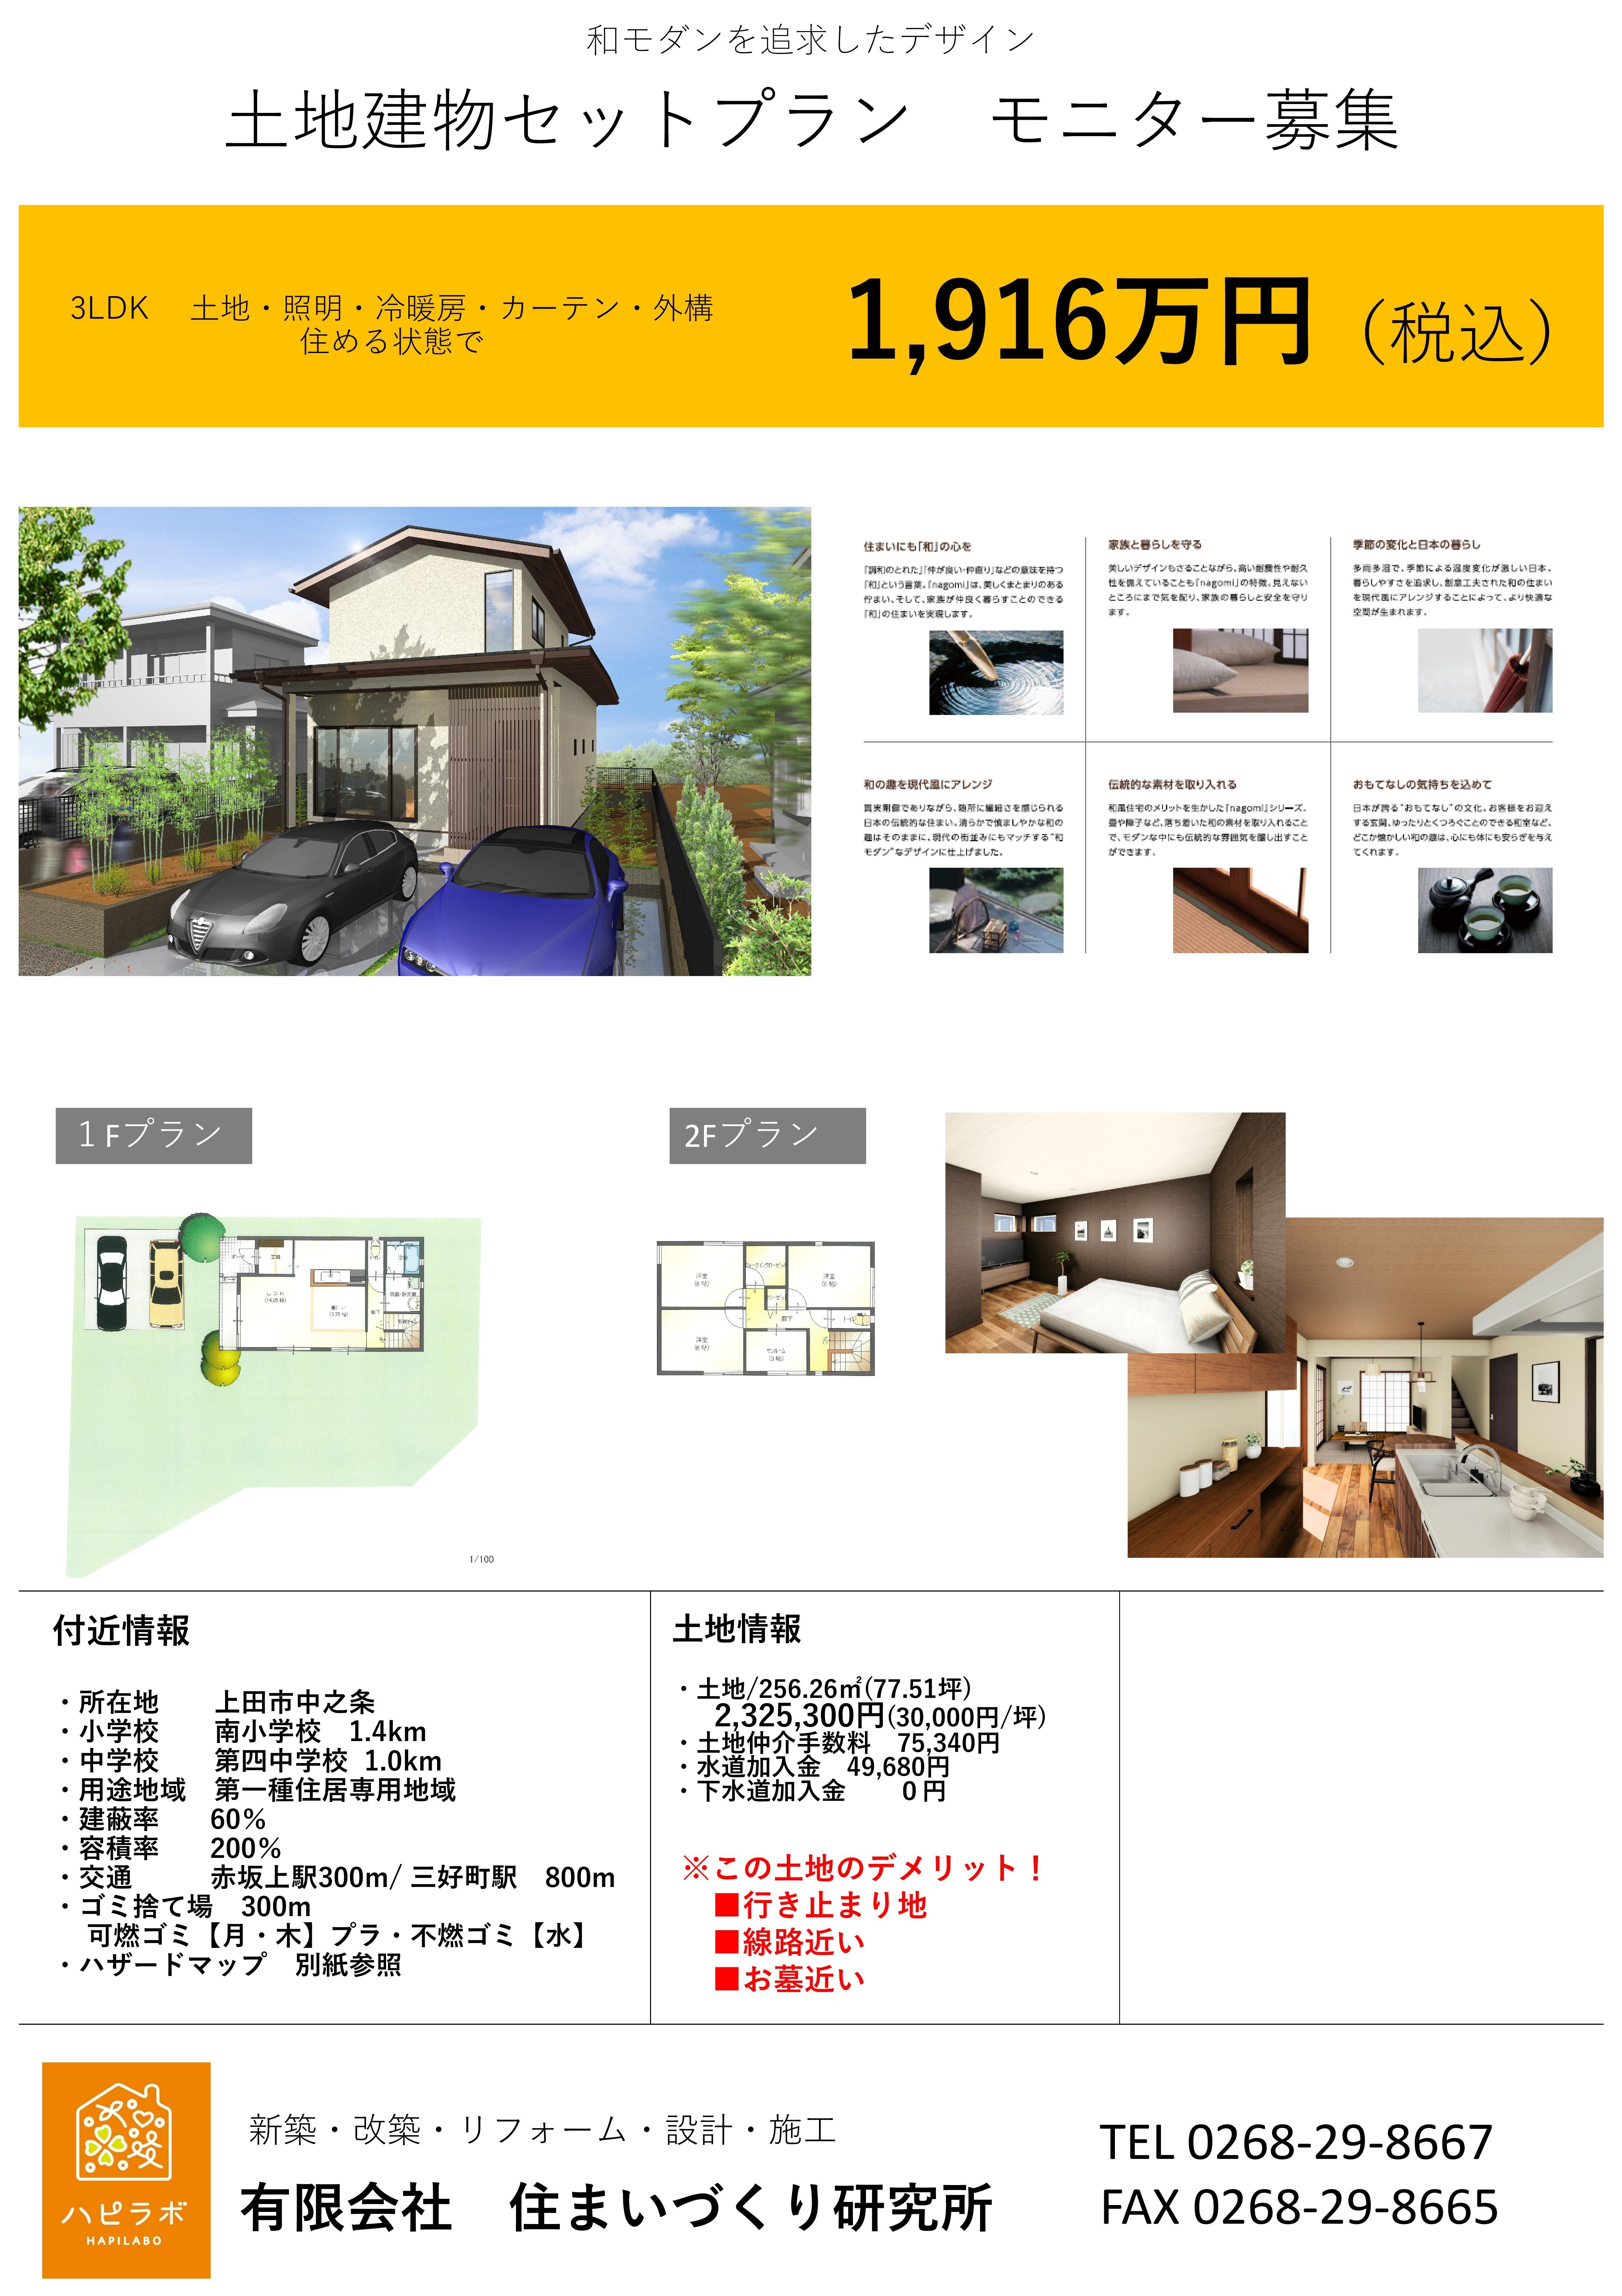 nagomi 土地建物.jpg